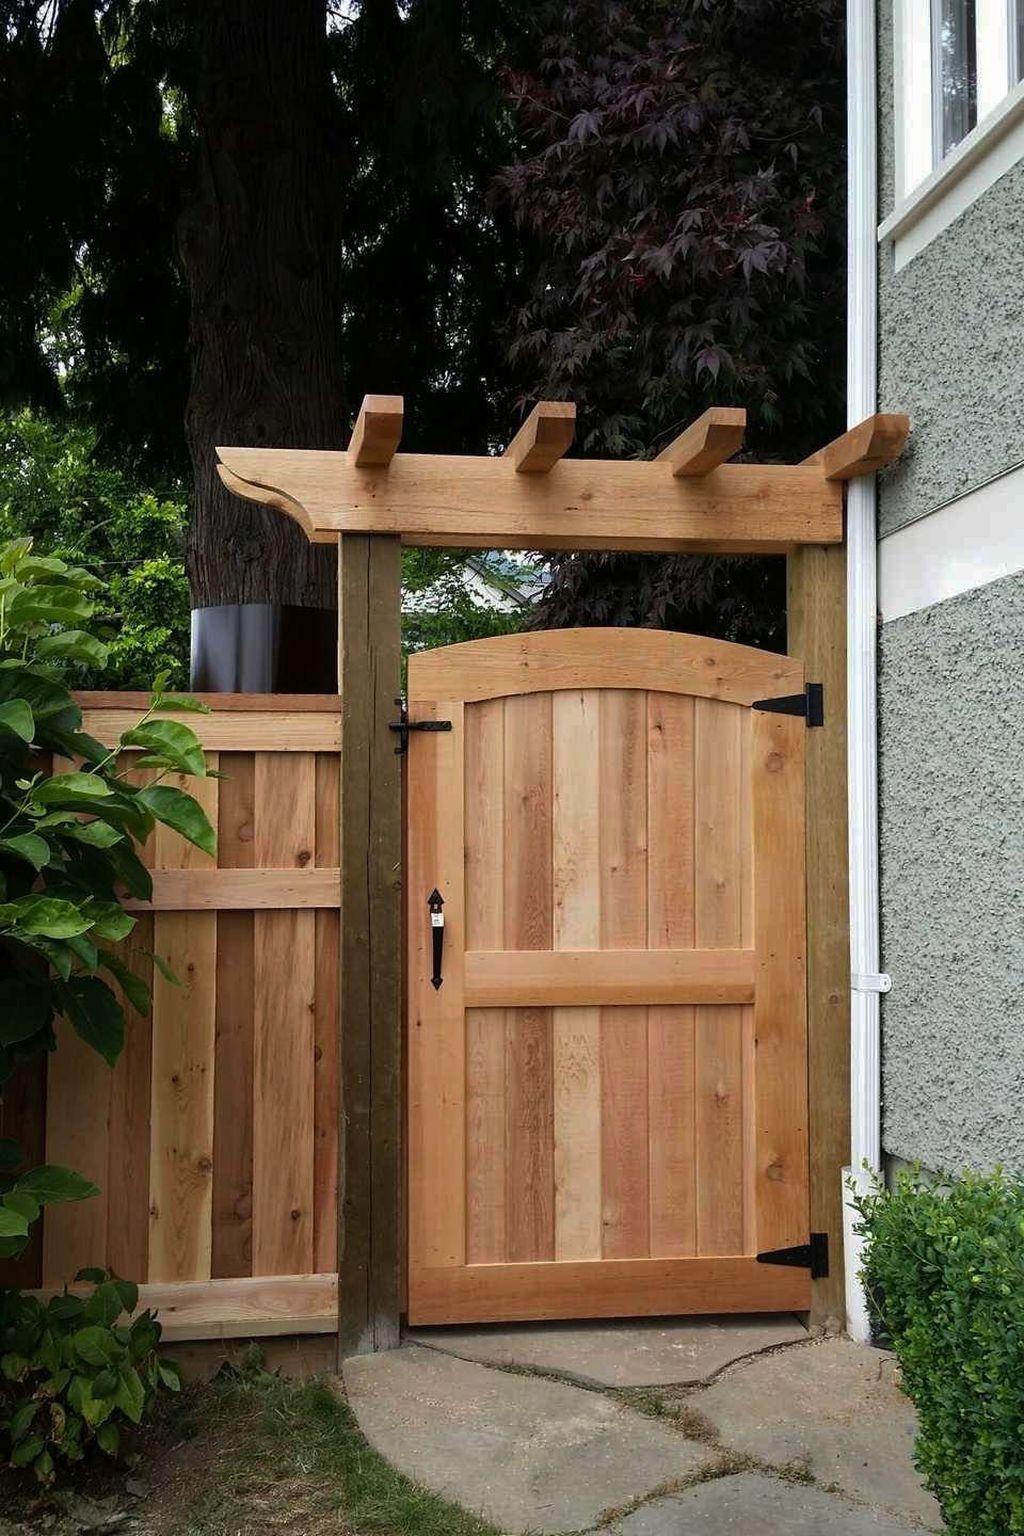 30 Charming Privacy Fence Ideas For Gardens En 2020 Amenagement